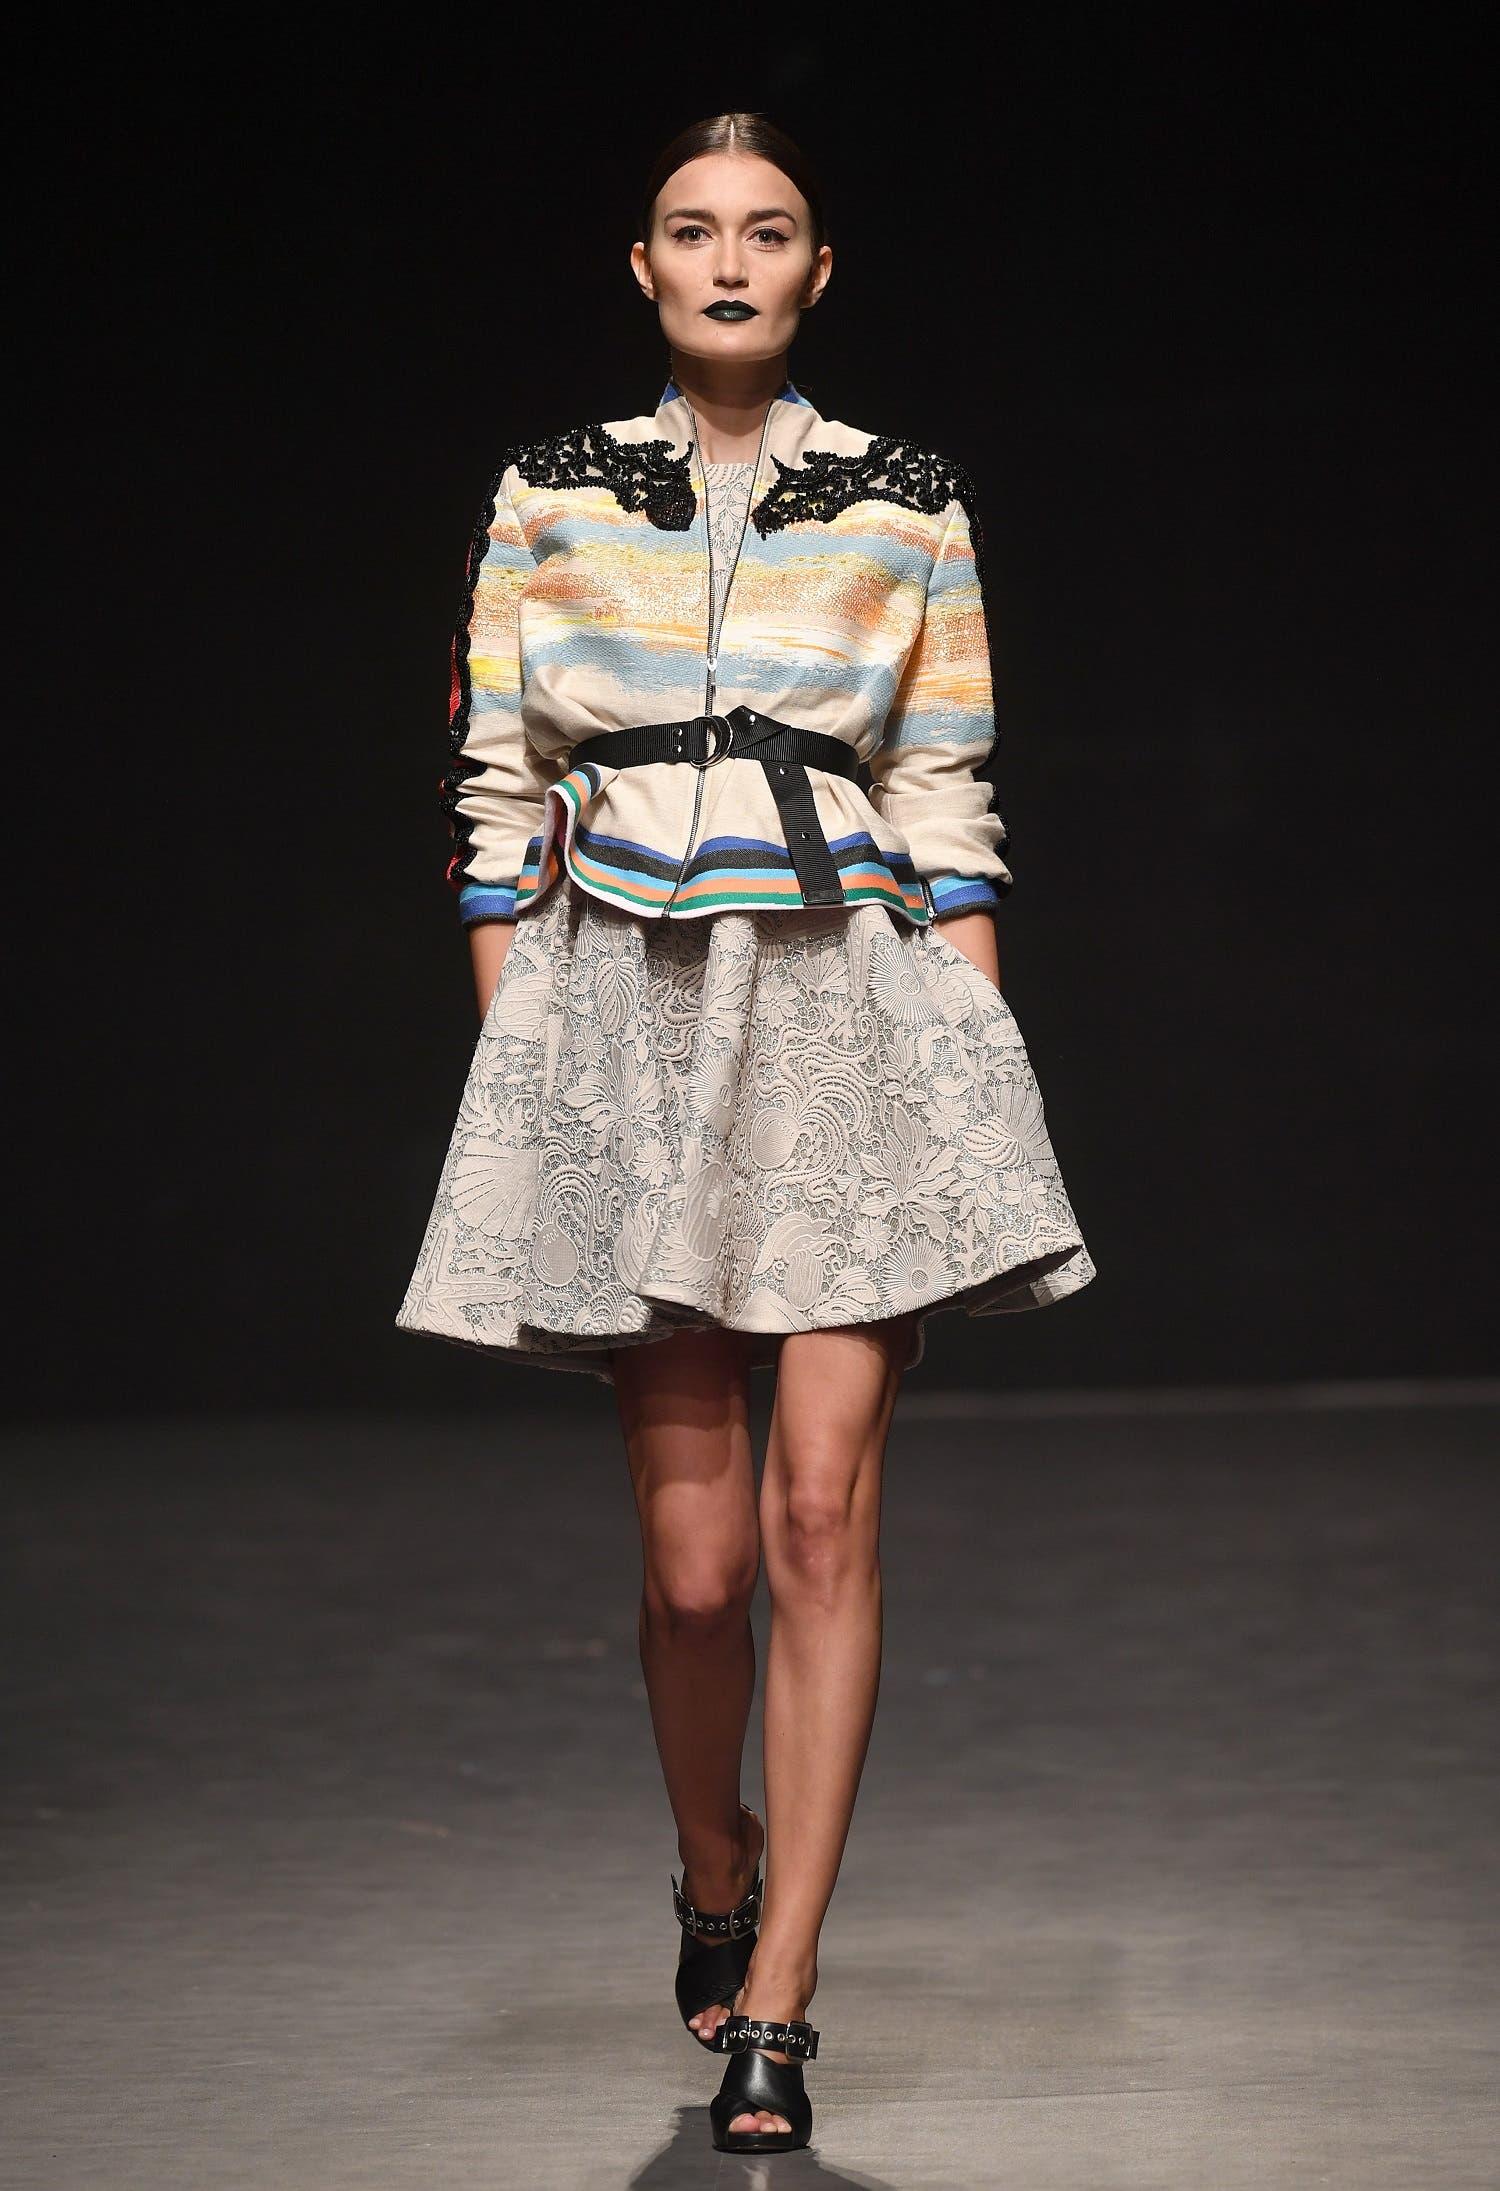 (Photos supplied by Fashion Forward Dubai courtesy of Getty Images)